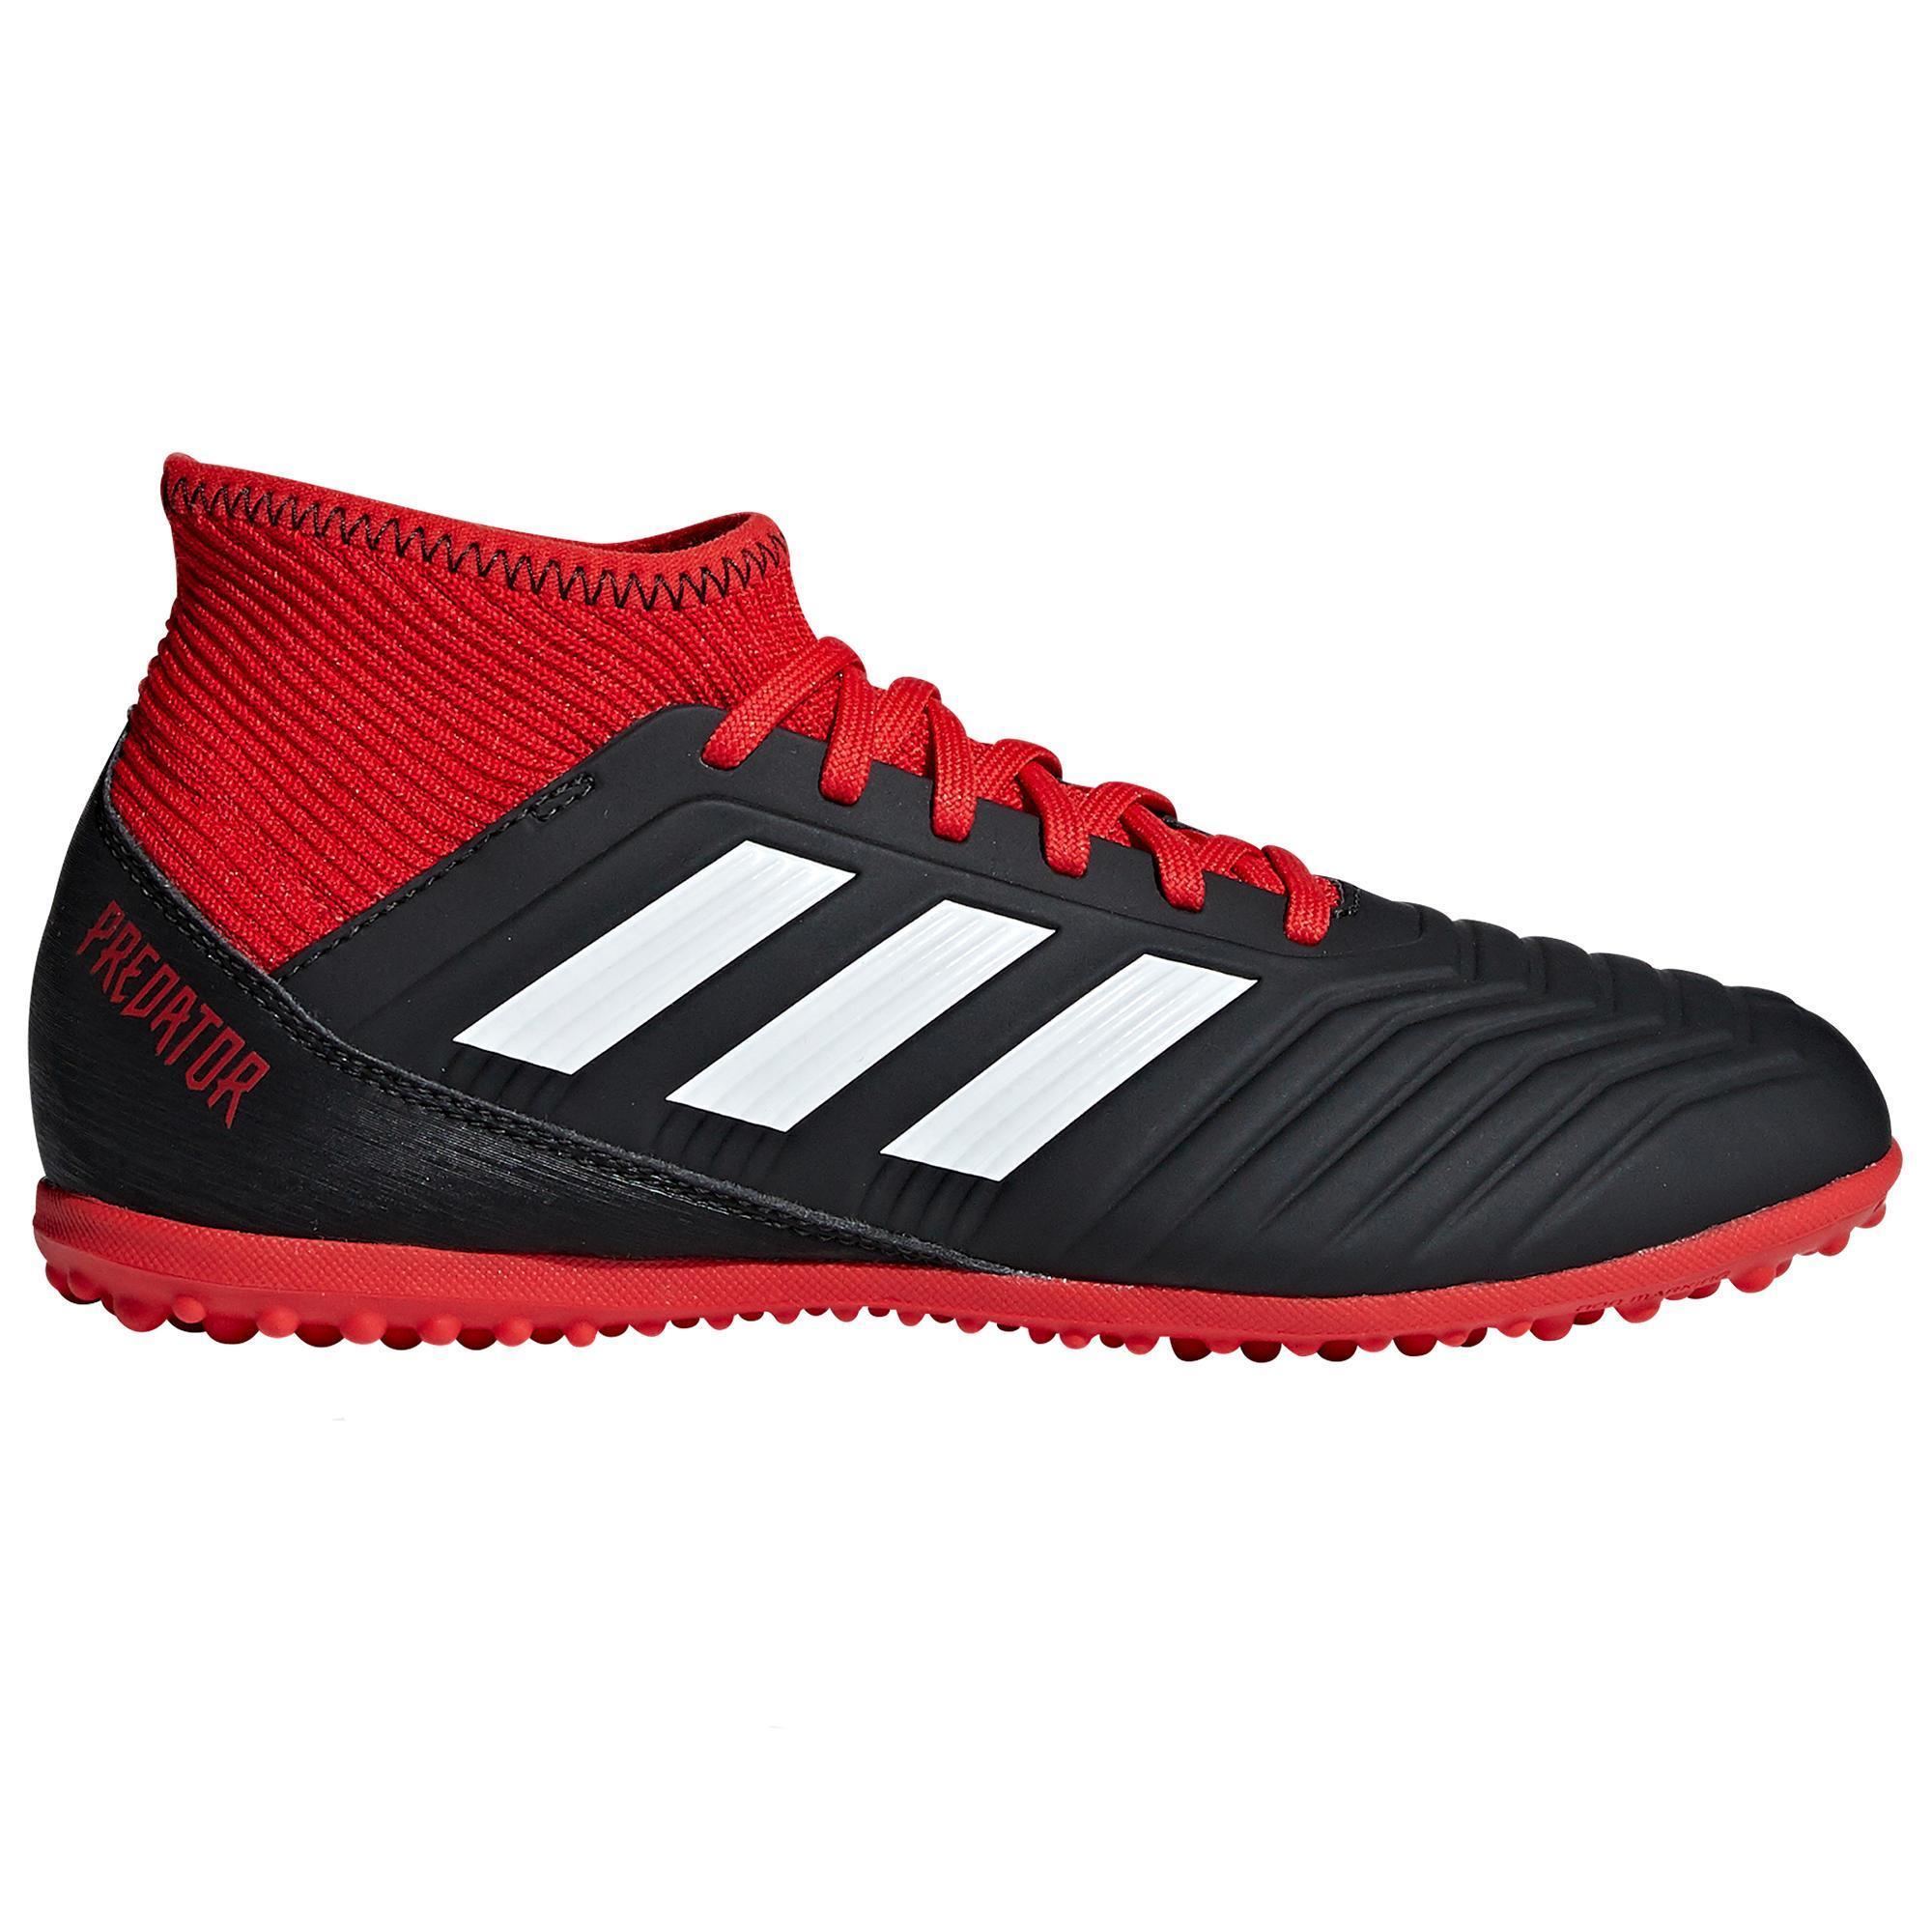 buy popular 3f91f f9e8d ... discount fußballschuhe multinocken predator 18.3 hg kinder schwarz  adidas decathlon b6893 fc49f